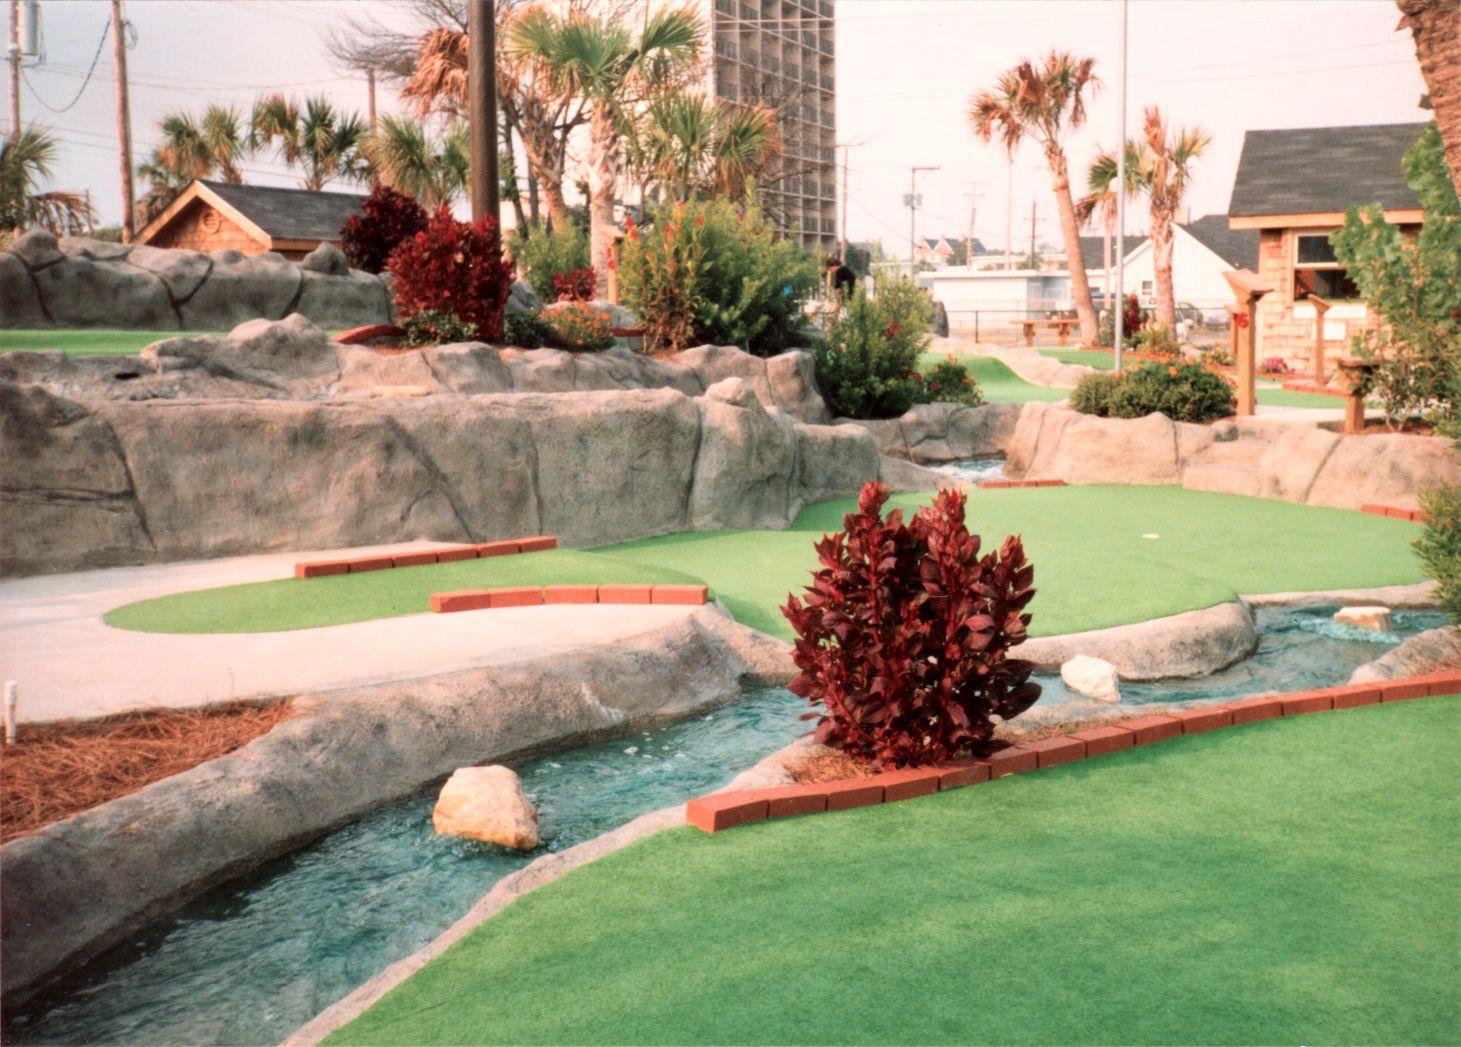 myrtle beach miniature golf ocean adventure golf